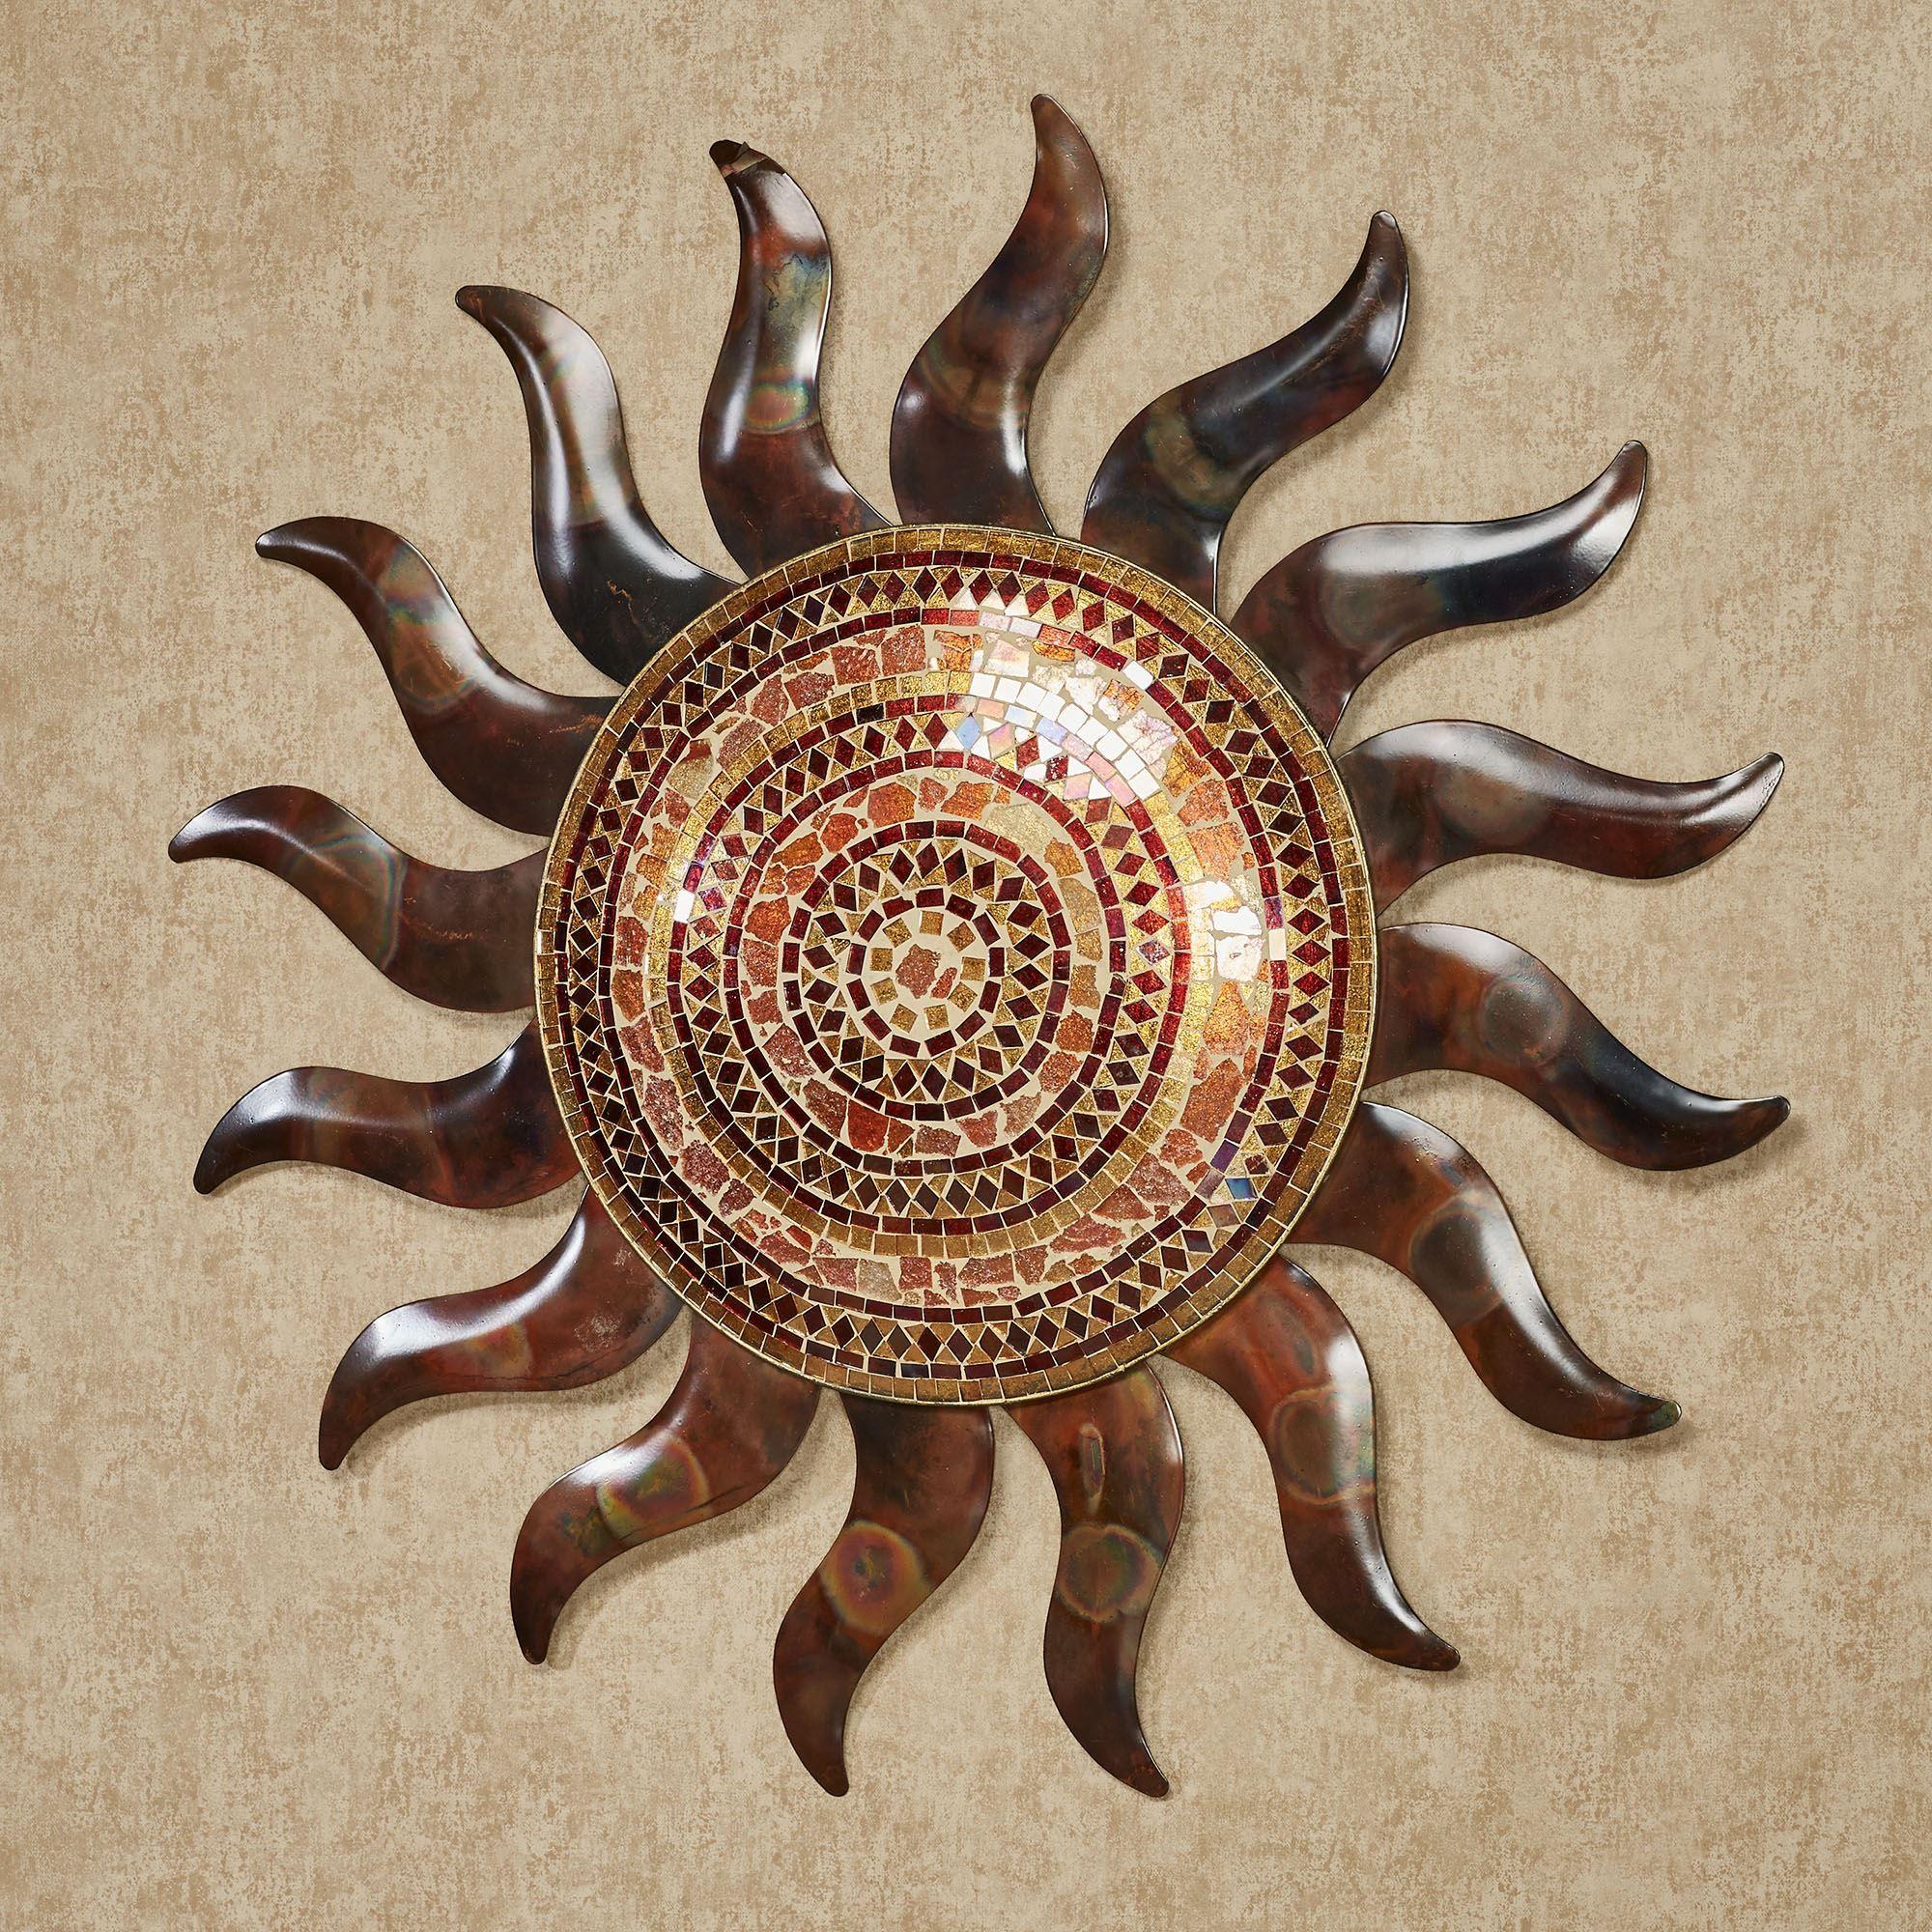 Mosaic Sun Indoor Outdoor Mosaic Glass And Metal Wall Art Outdoor Copper Wall Art Copper Wall Art Sun Wall Decor